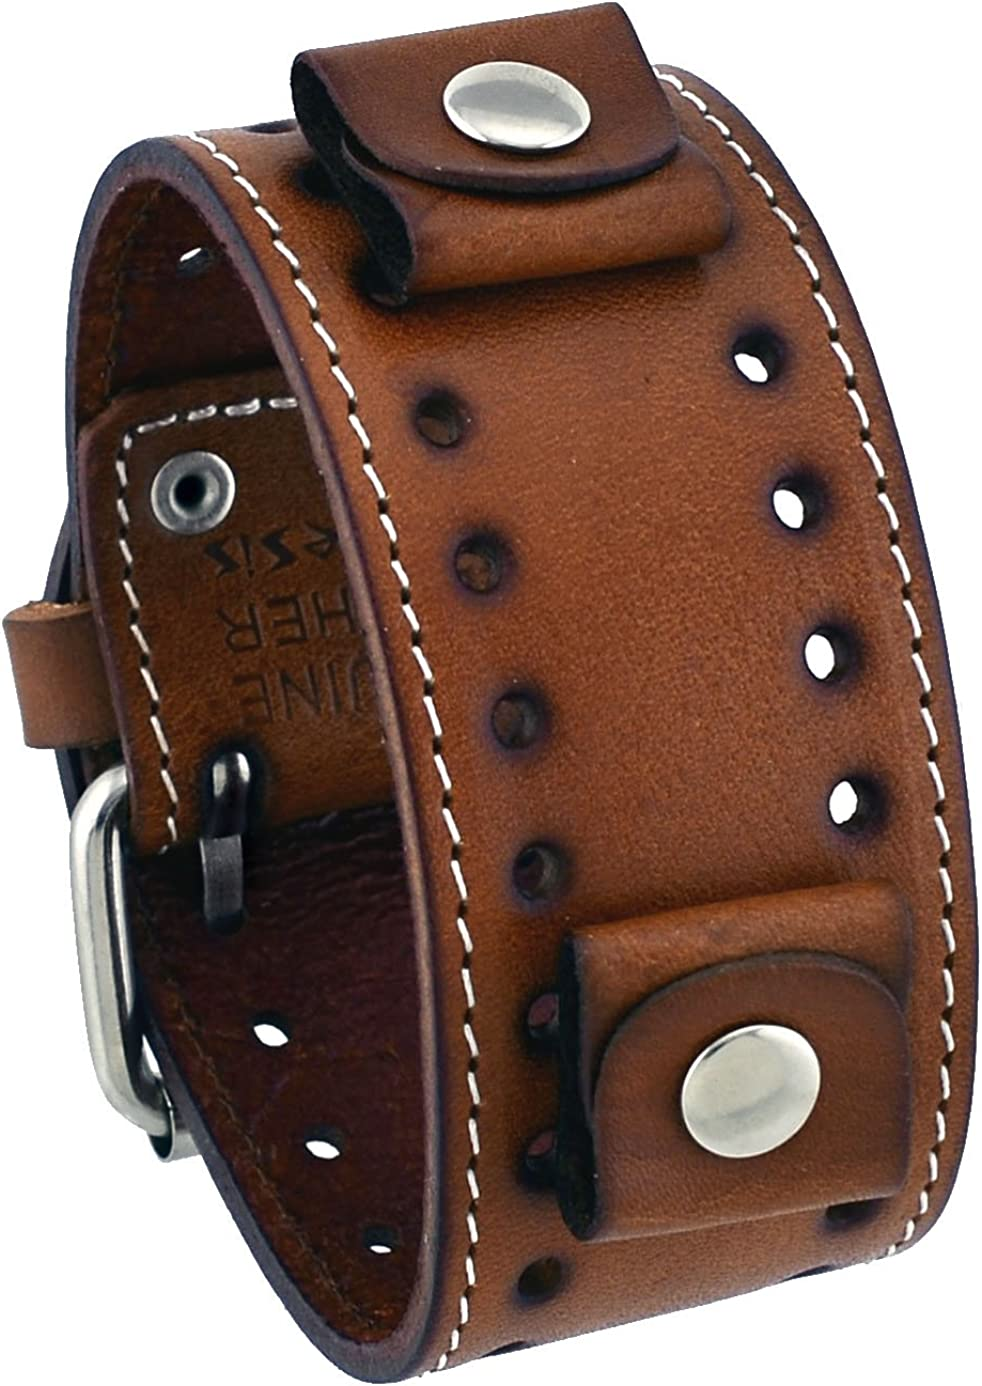 Nemesis STH-B 22 Lug Width Brown Wide Leather Cuff Wrist Watch Band